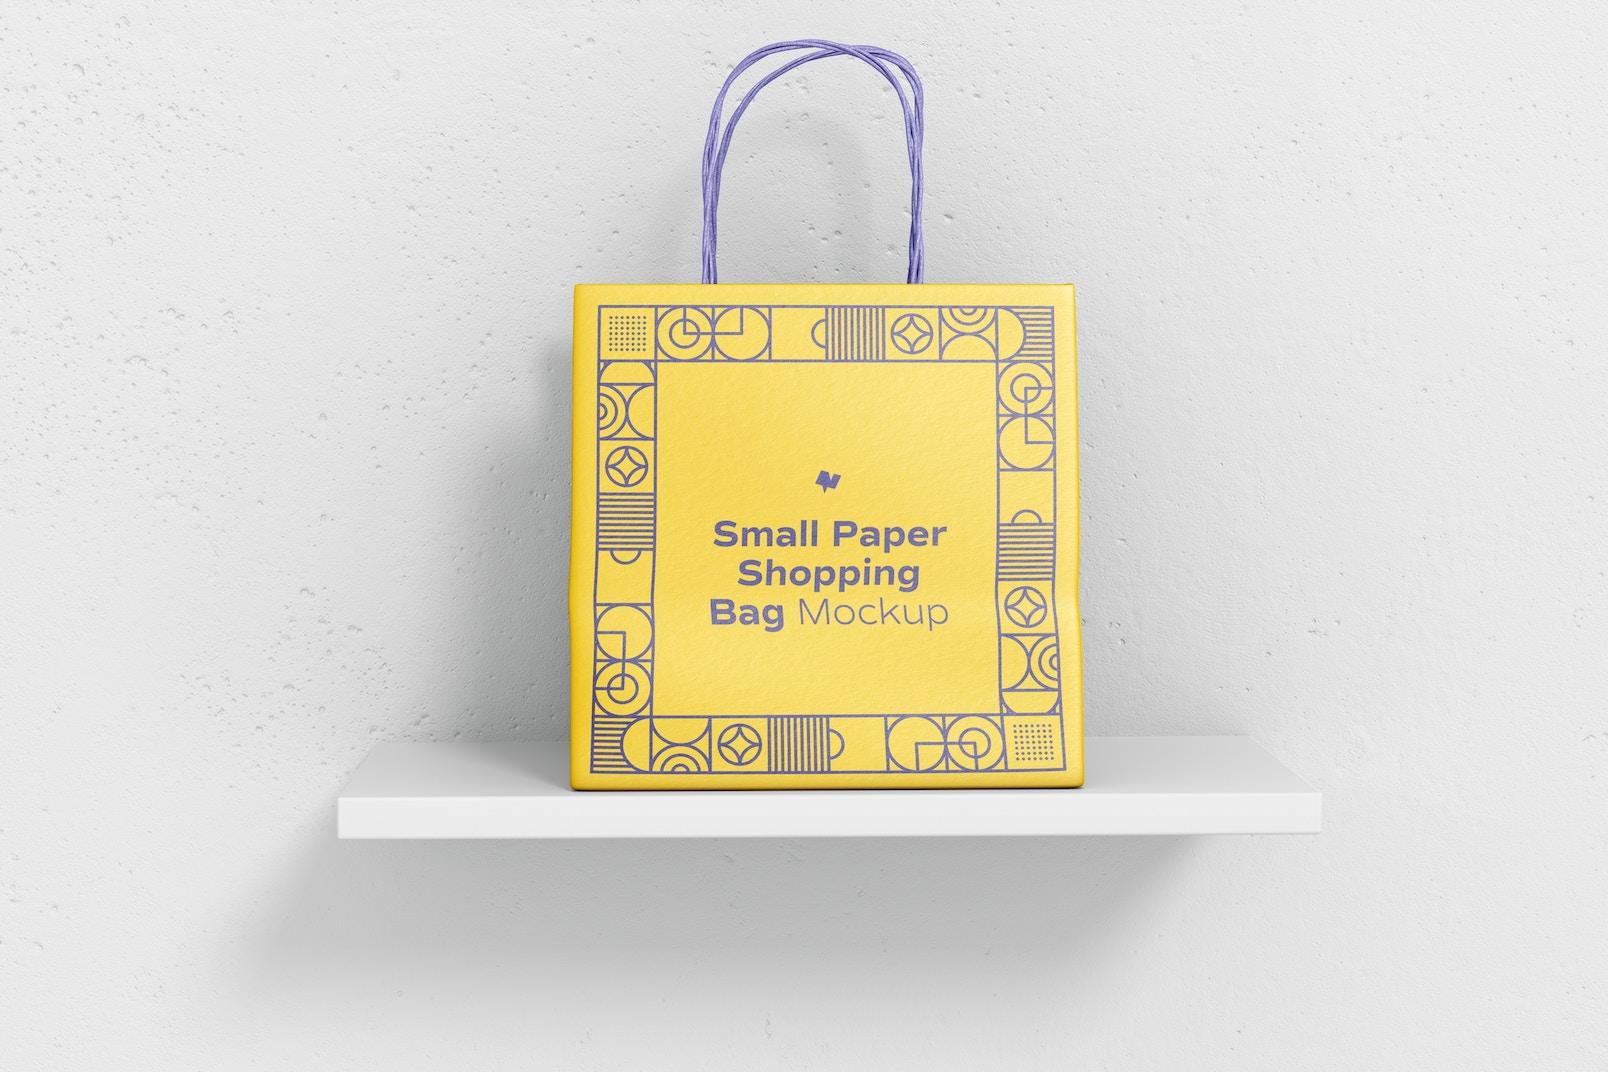 Small Paper Shopping Bag Mockup, Front View